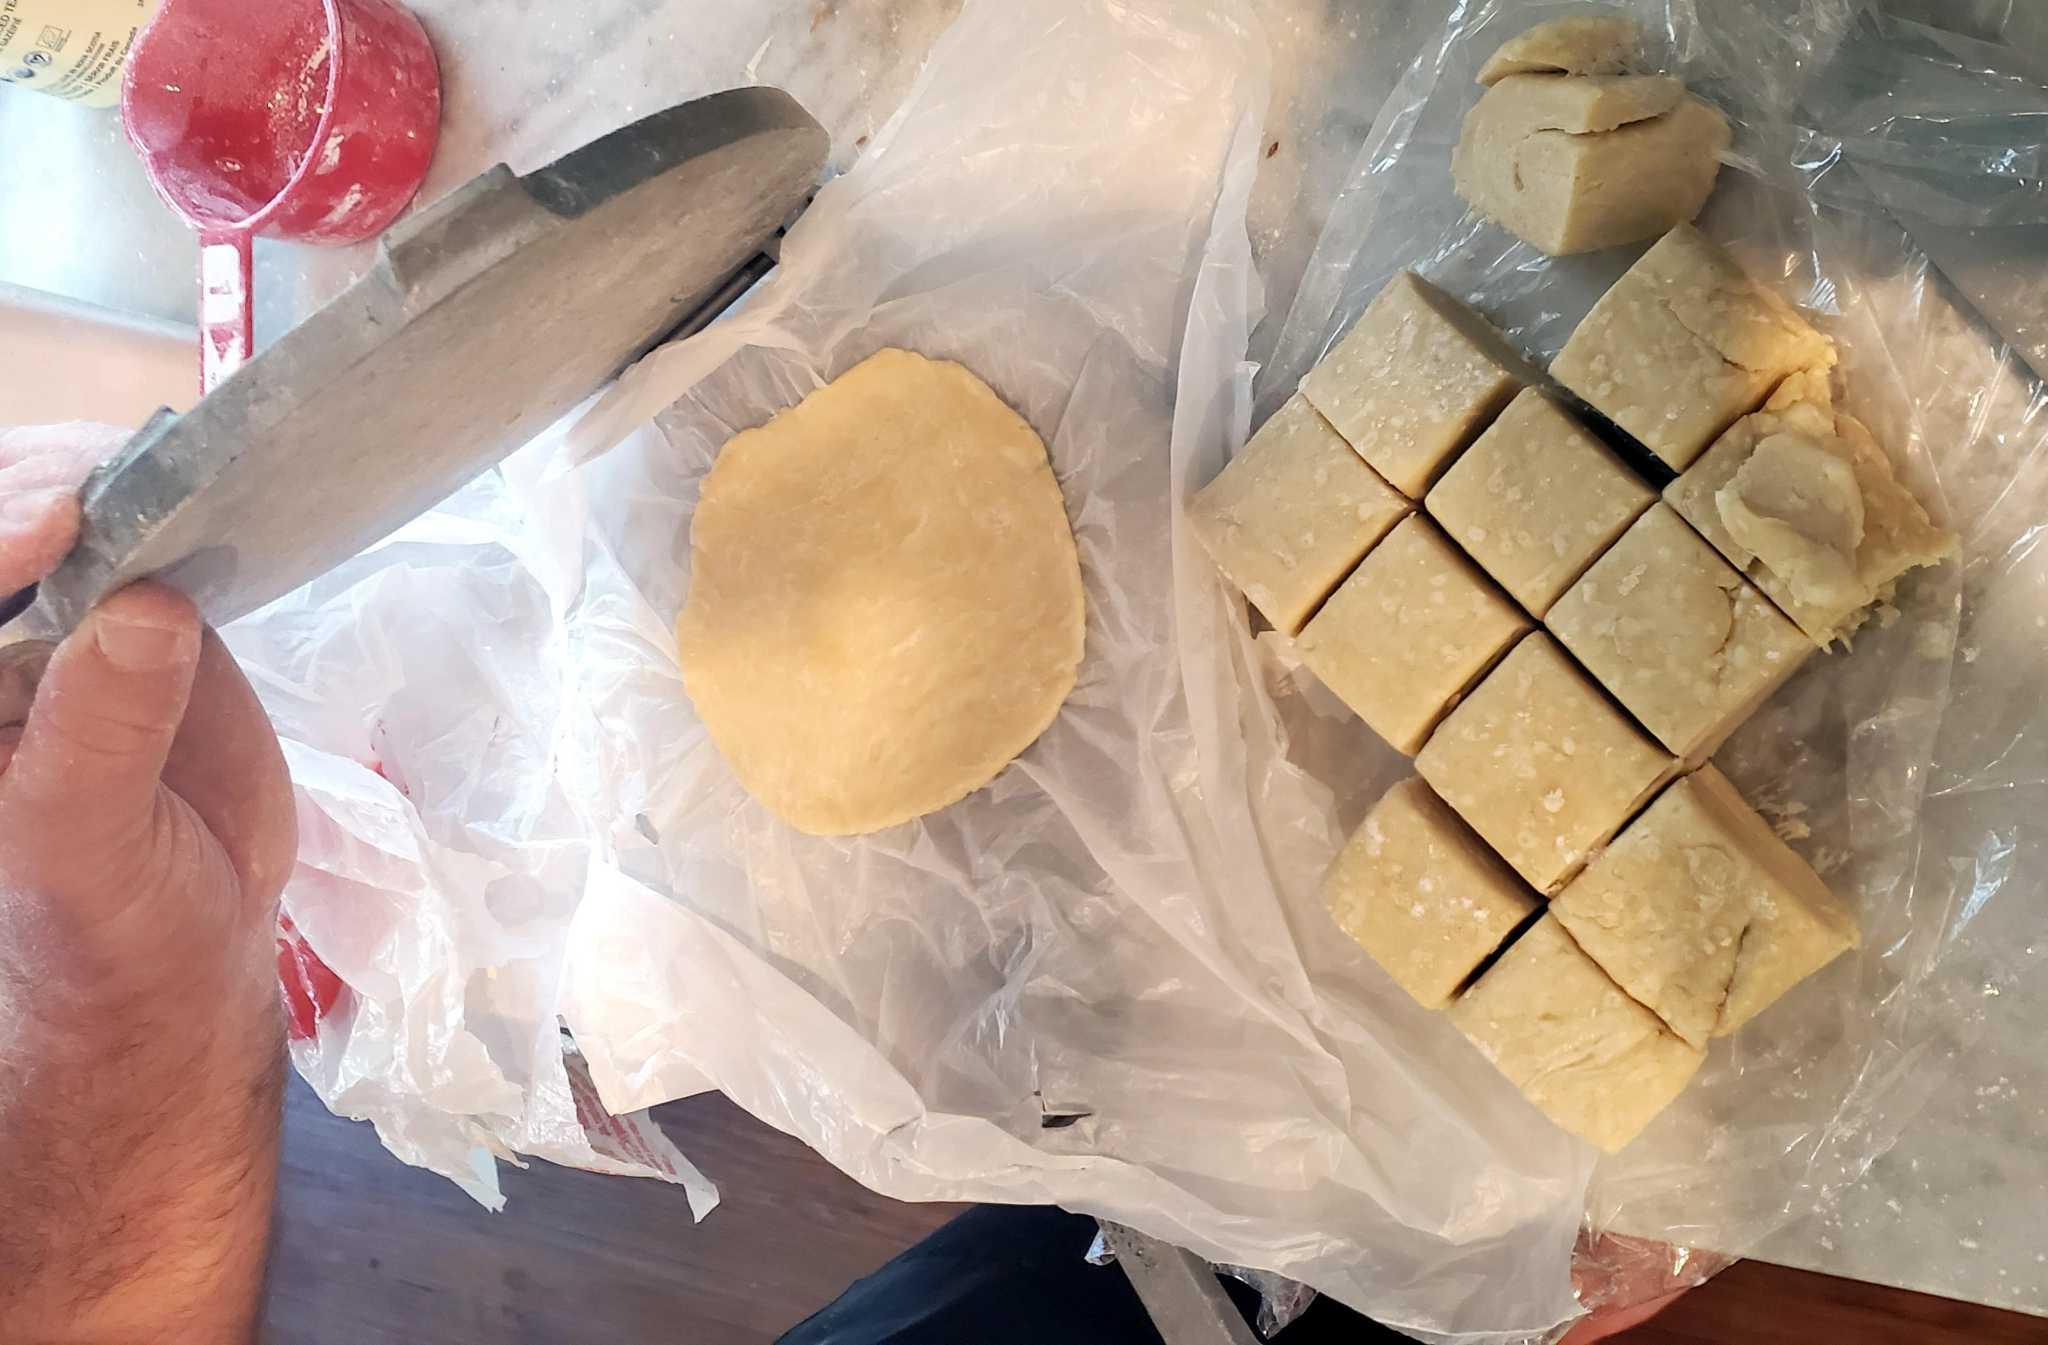 Recipe: Basic Empanada Dough